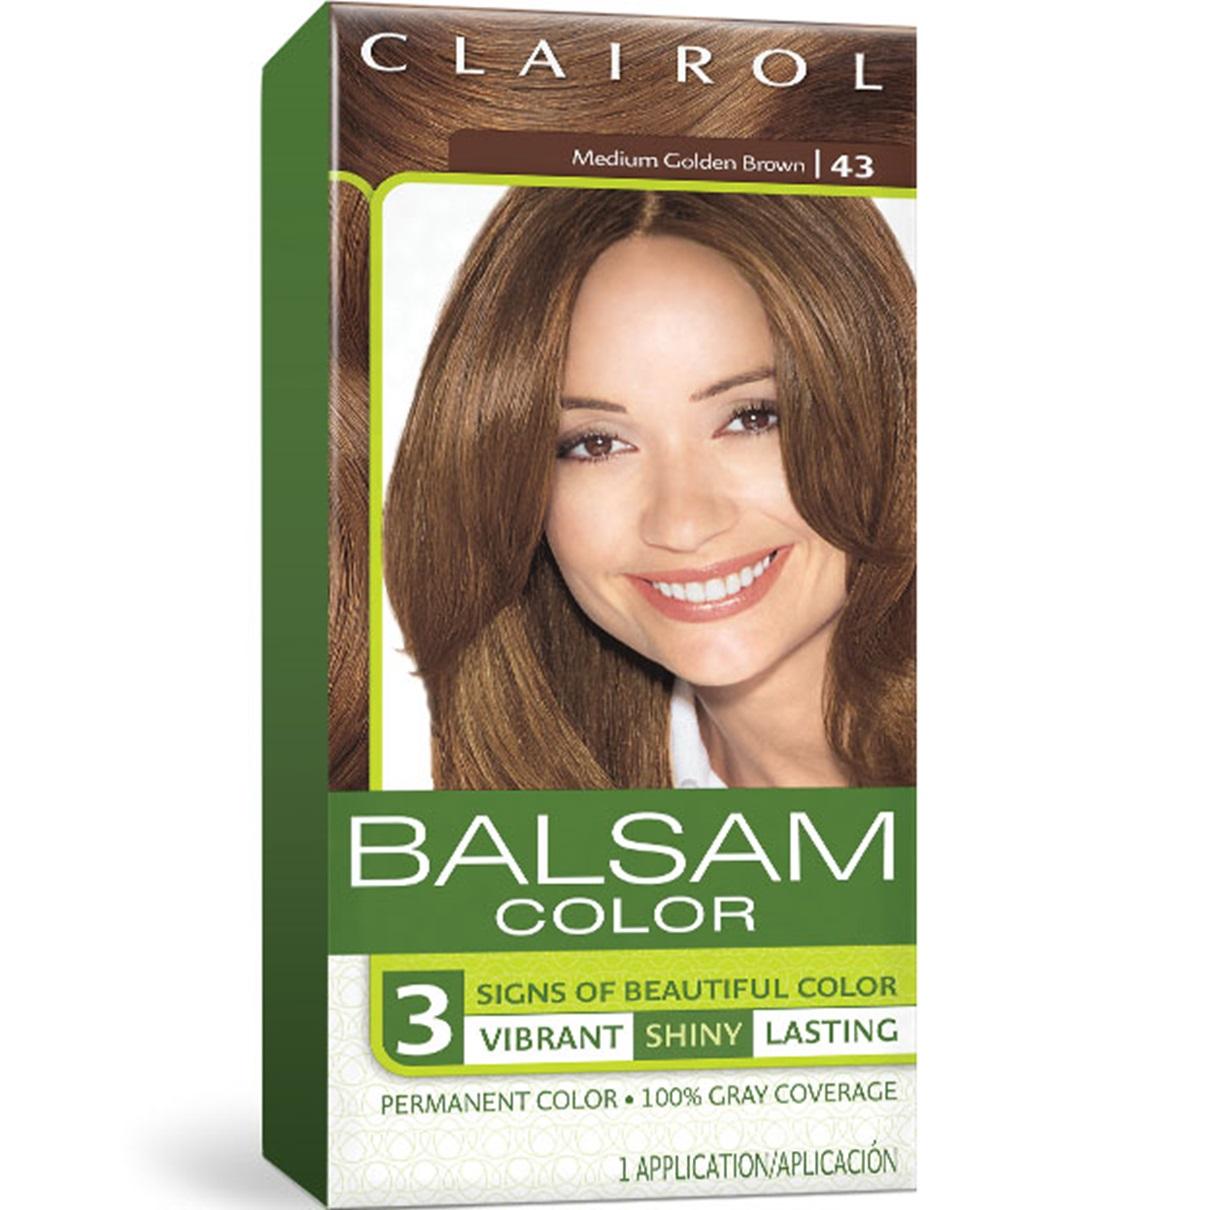 Balsam Permanent Brunette Hair Color Clairol